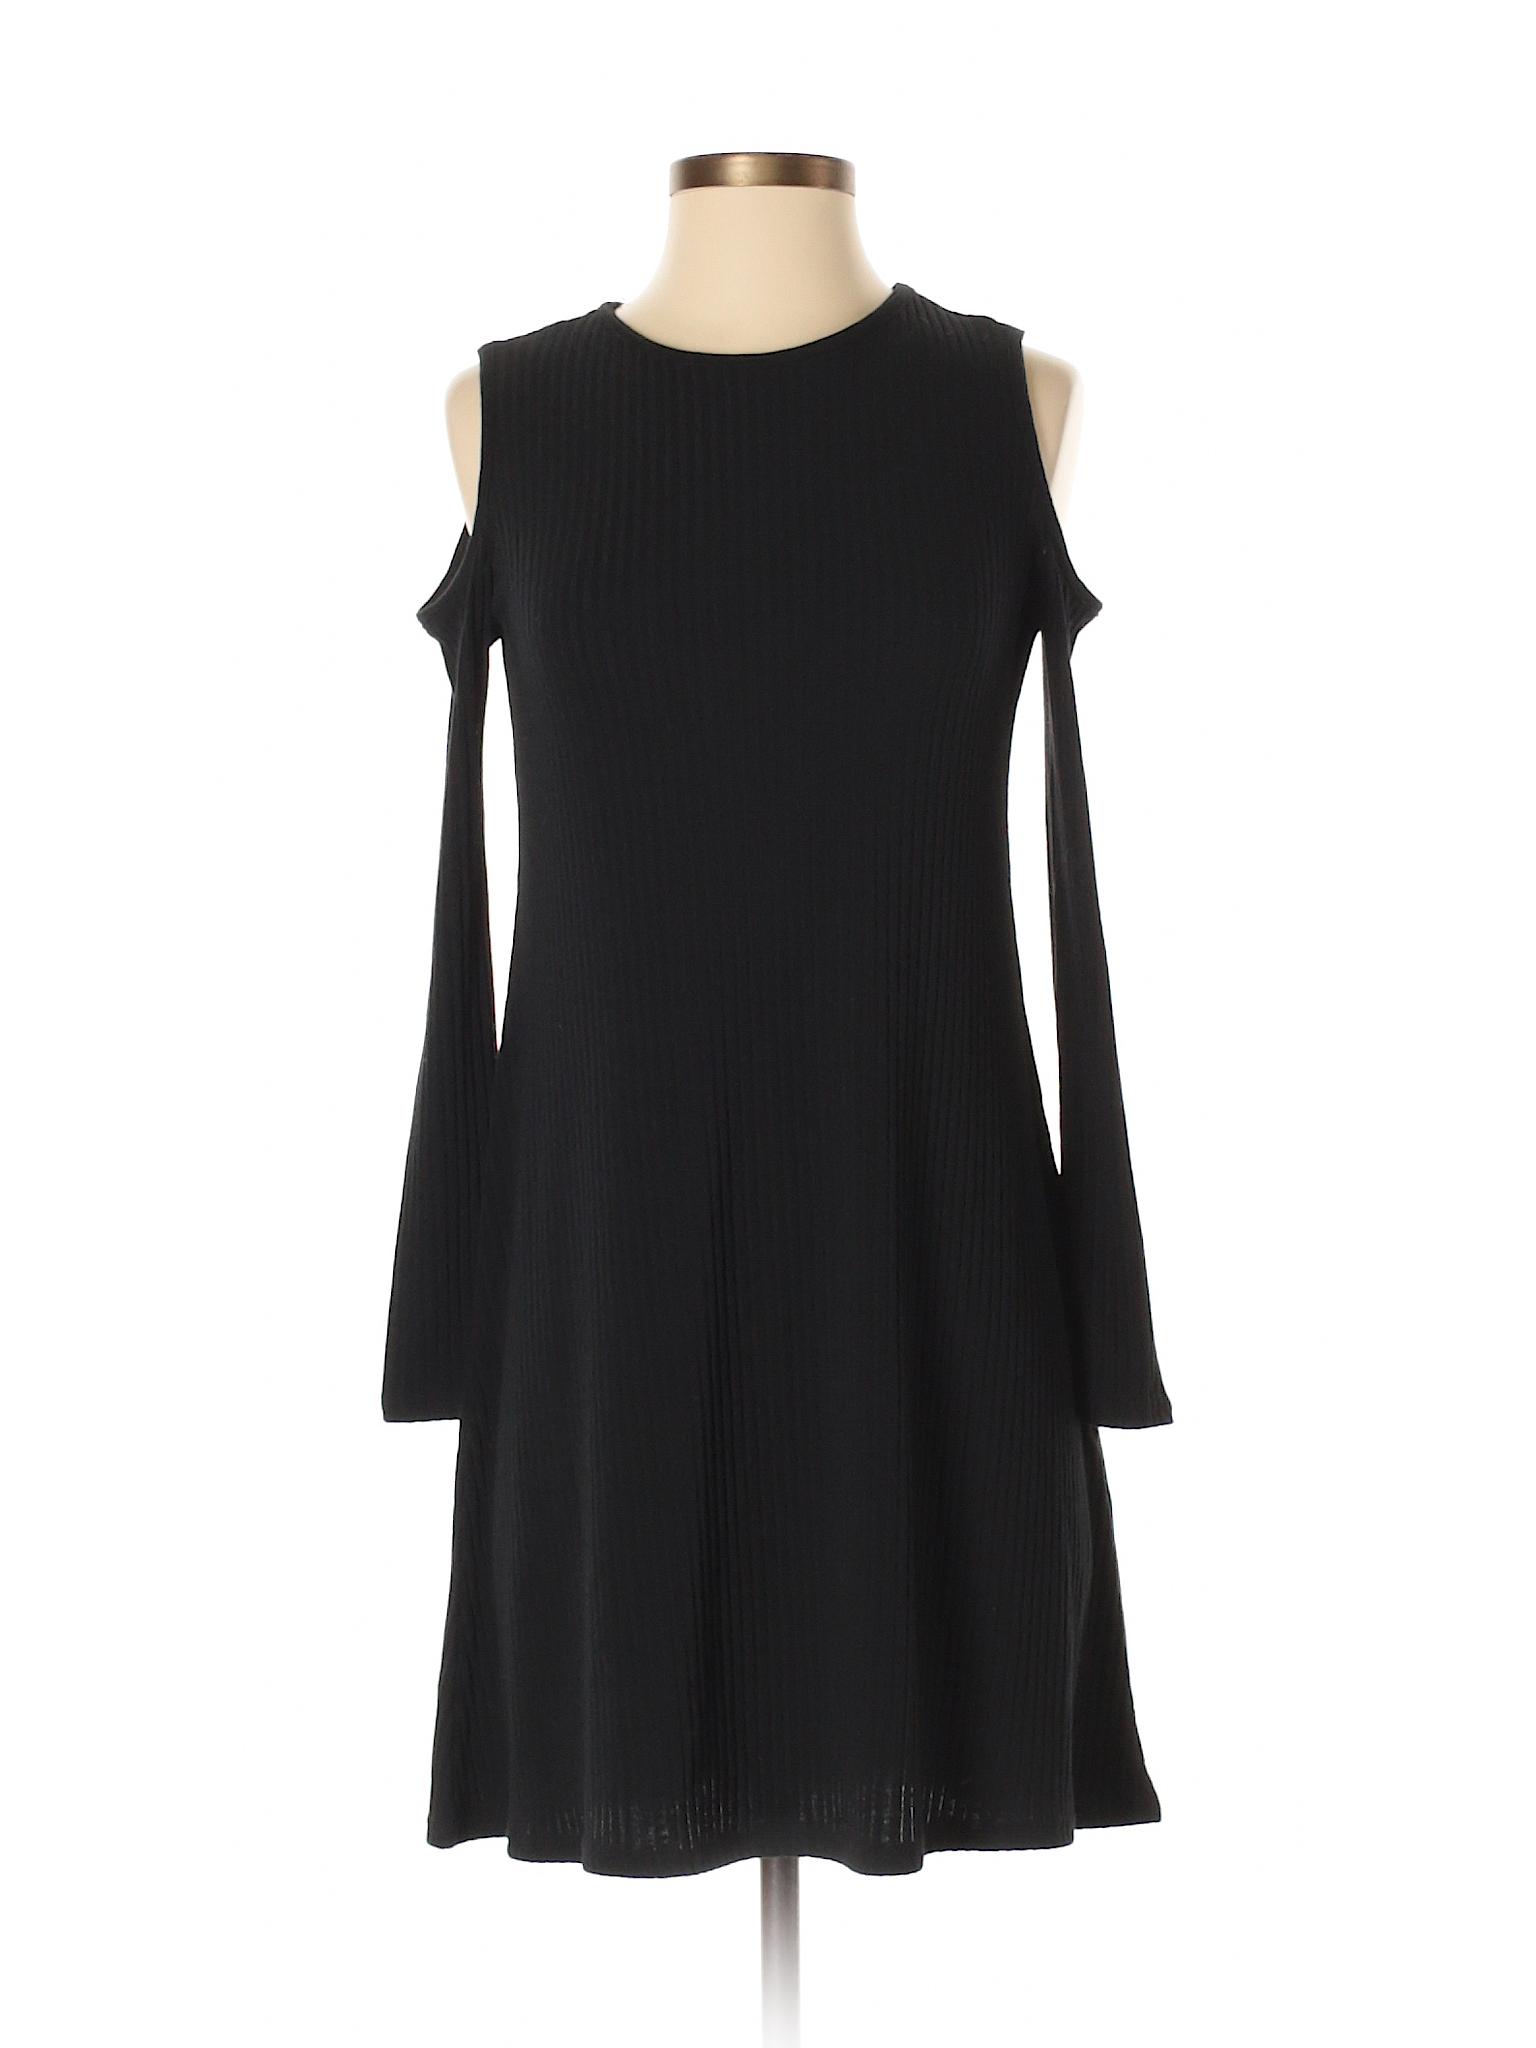 Boutique Boohoo winter Dress Casual Boutique PYE0qw